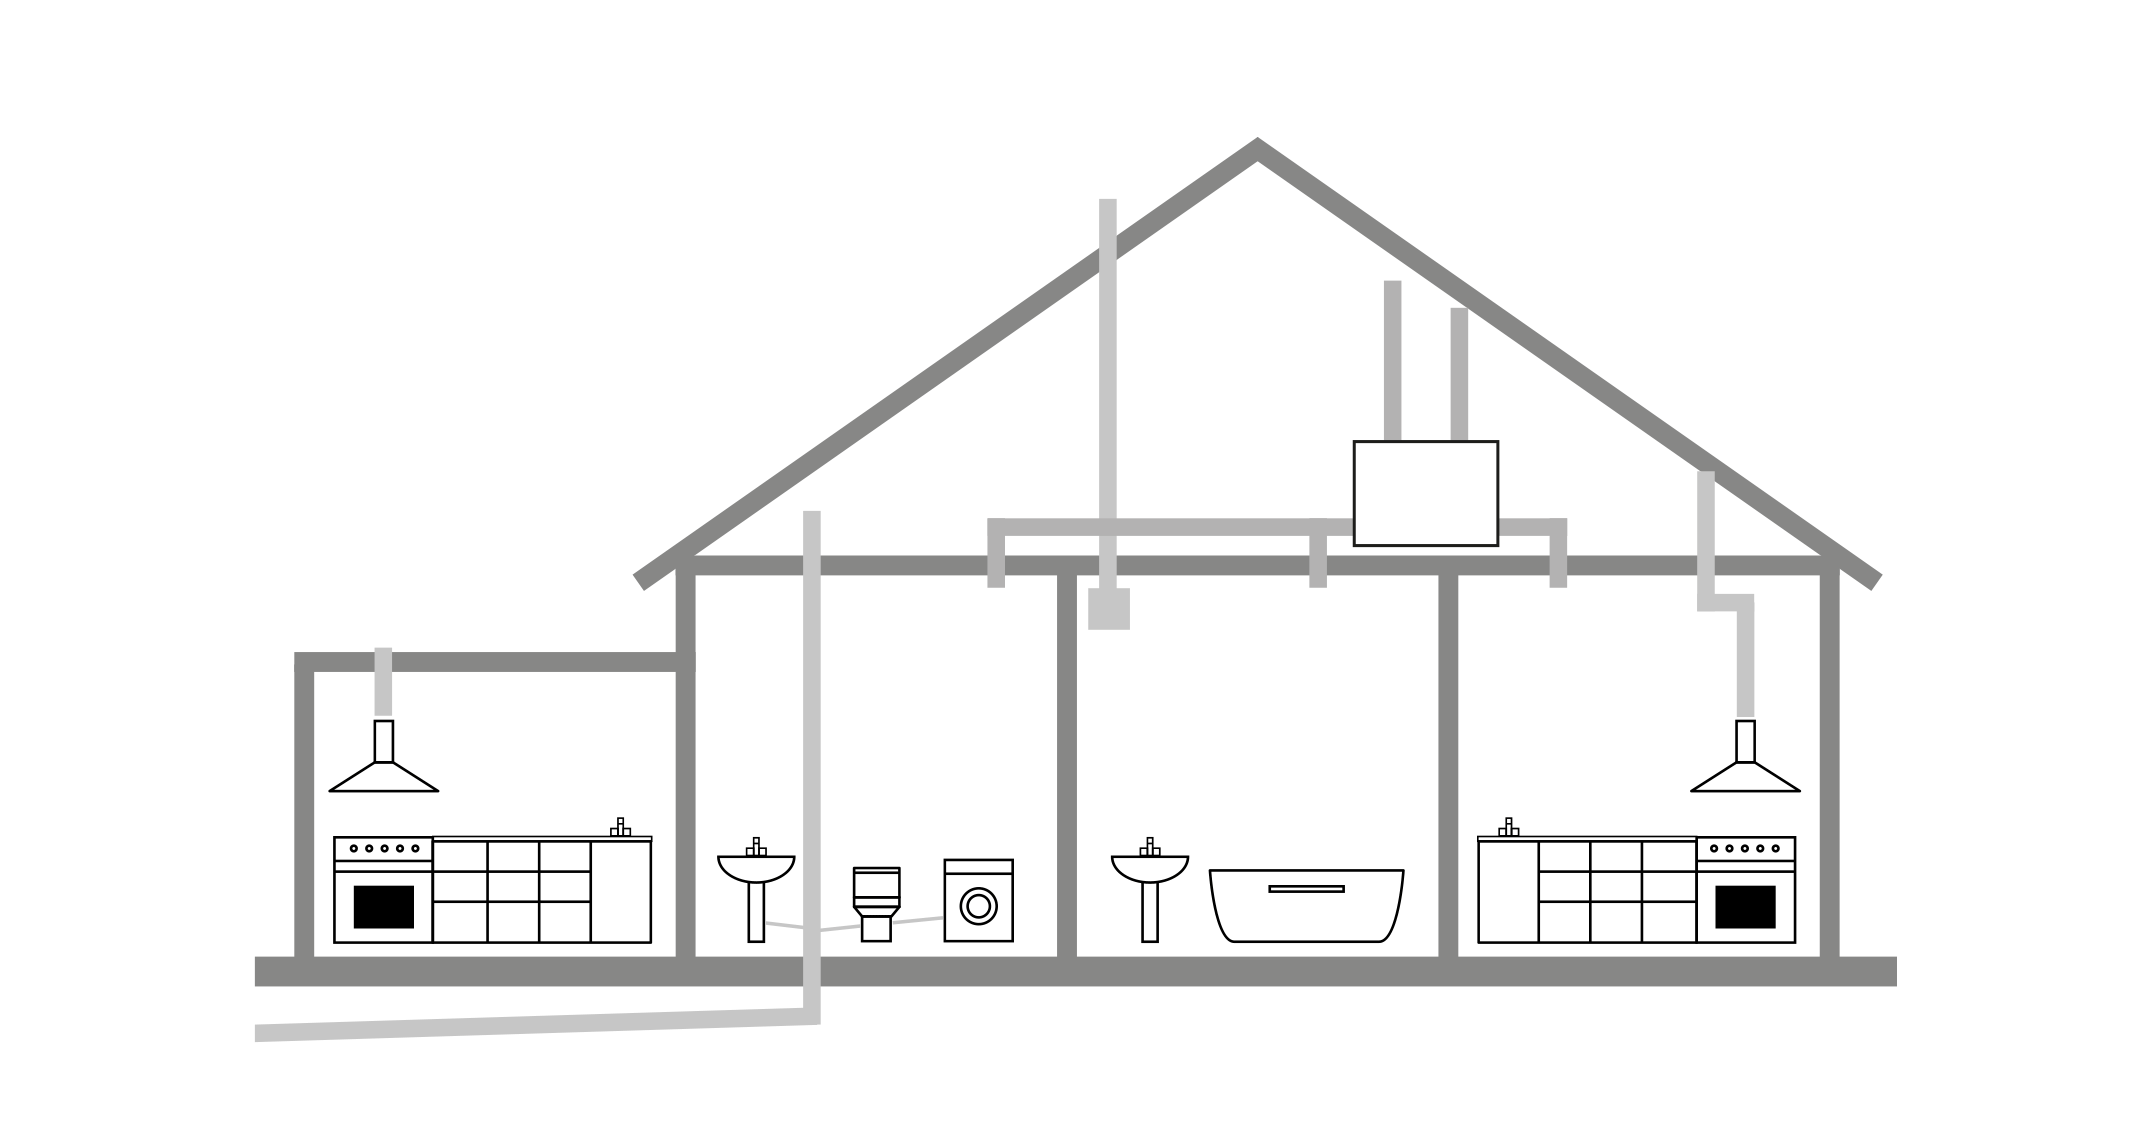 easytec Gebäude Anwendungsgebiete